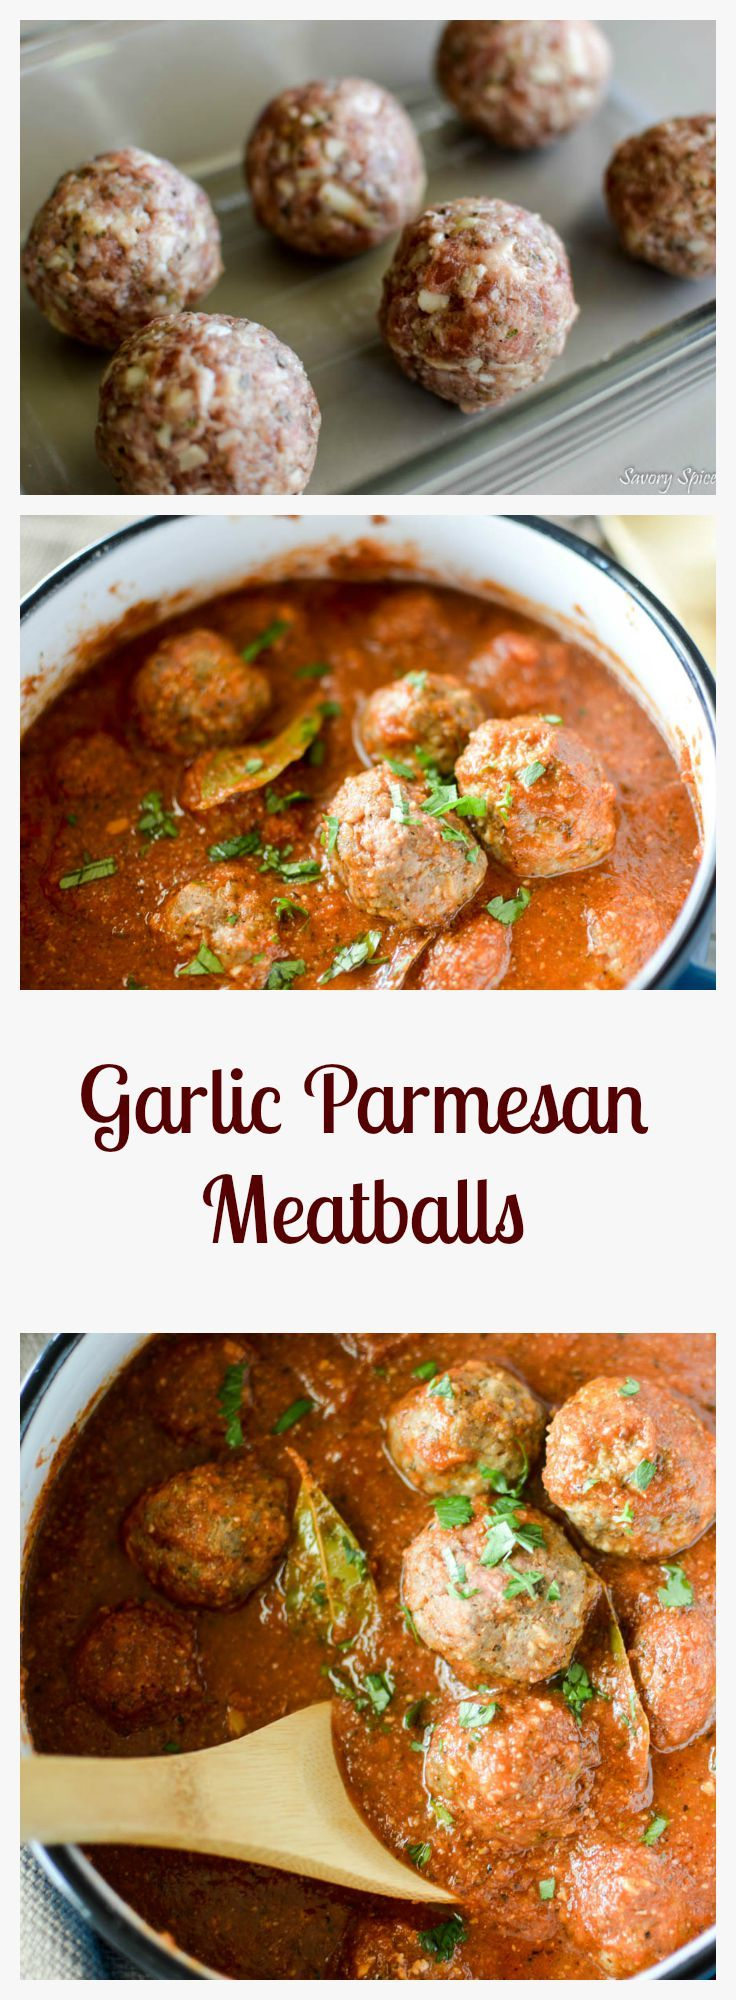 Pinner wrote: Delicious Garlic Parmesan Meatballs. Freezer Friendly for menu planning.